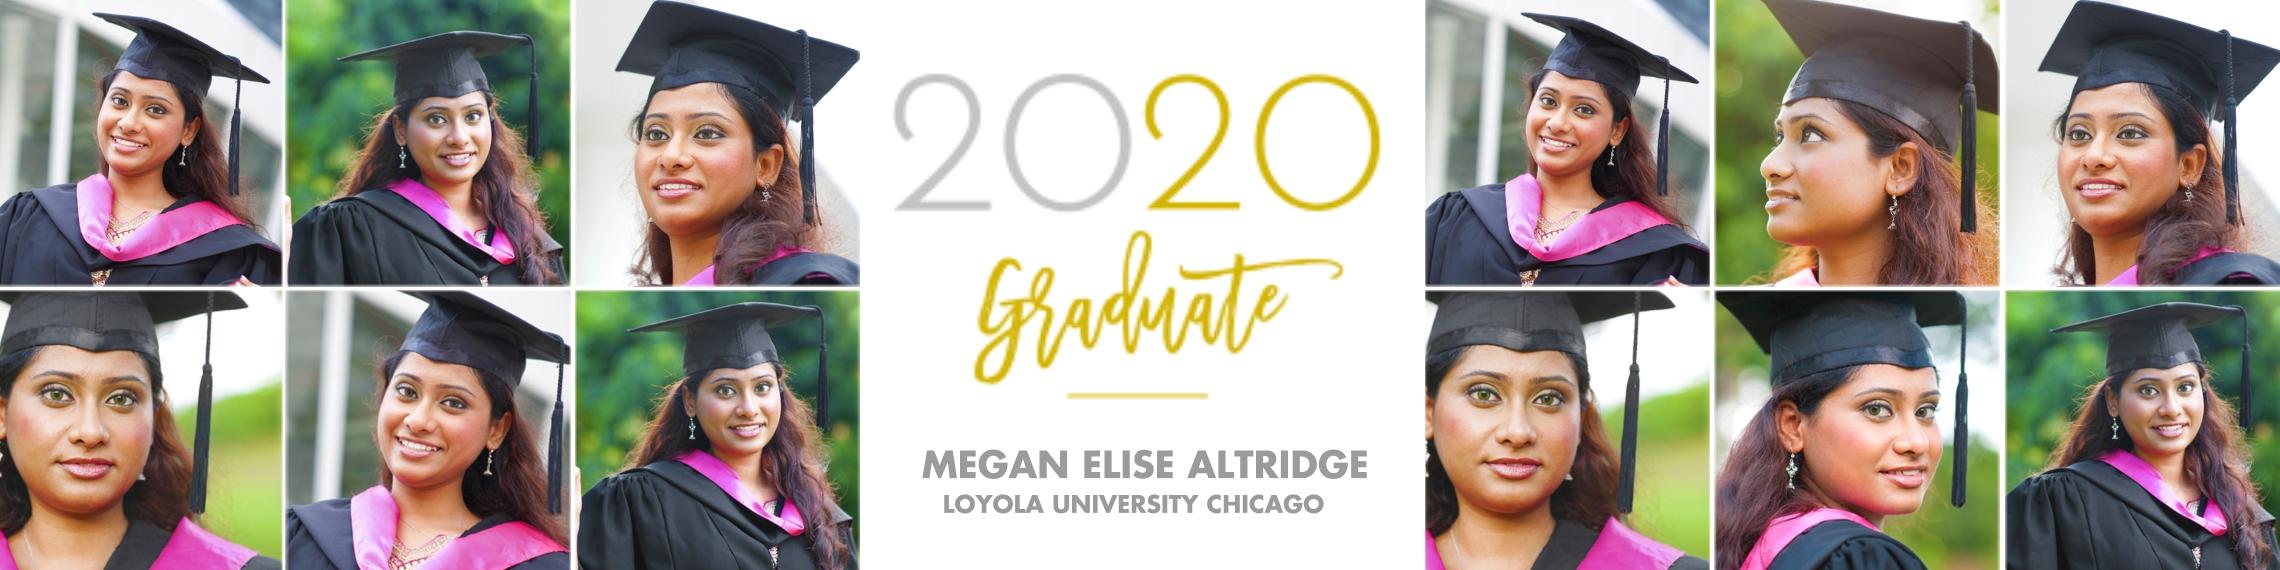 Graduation 2x8 Adhesive Banner, Home Décor -Modern Classic Graduate